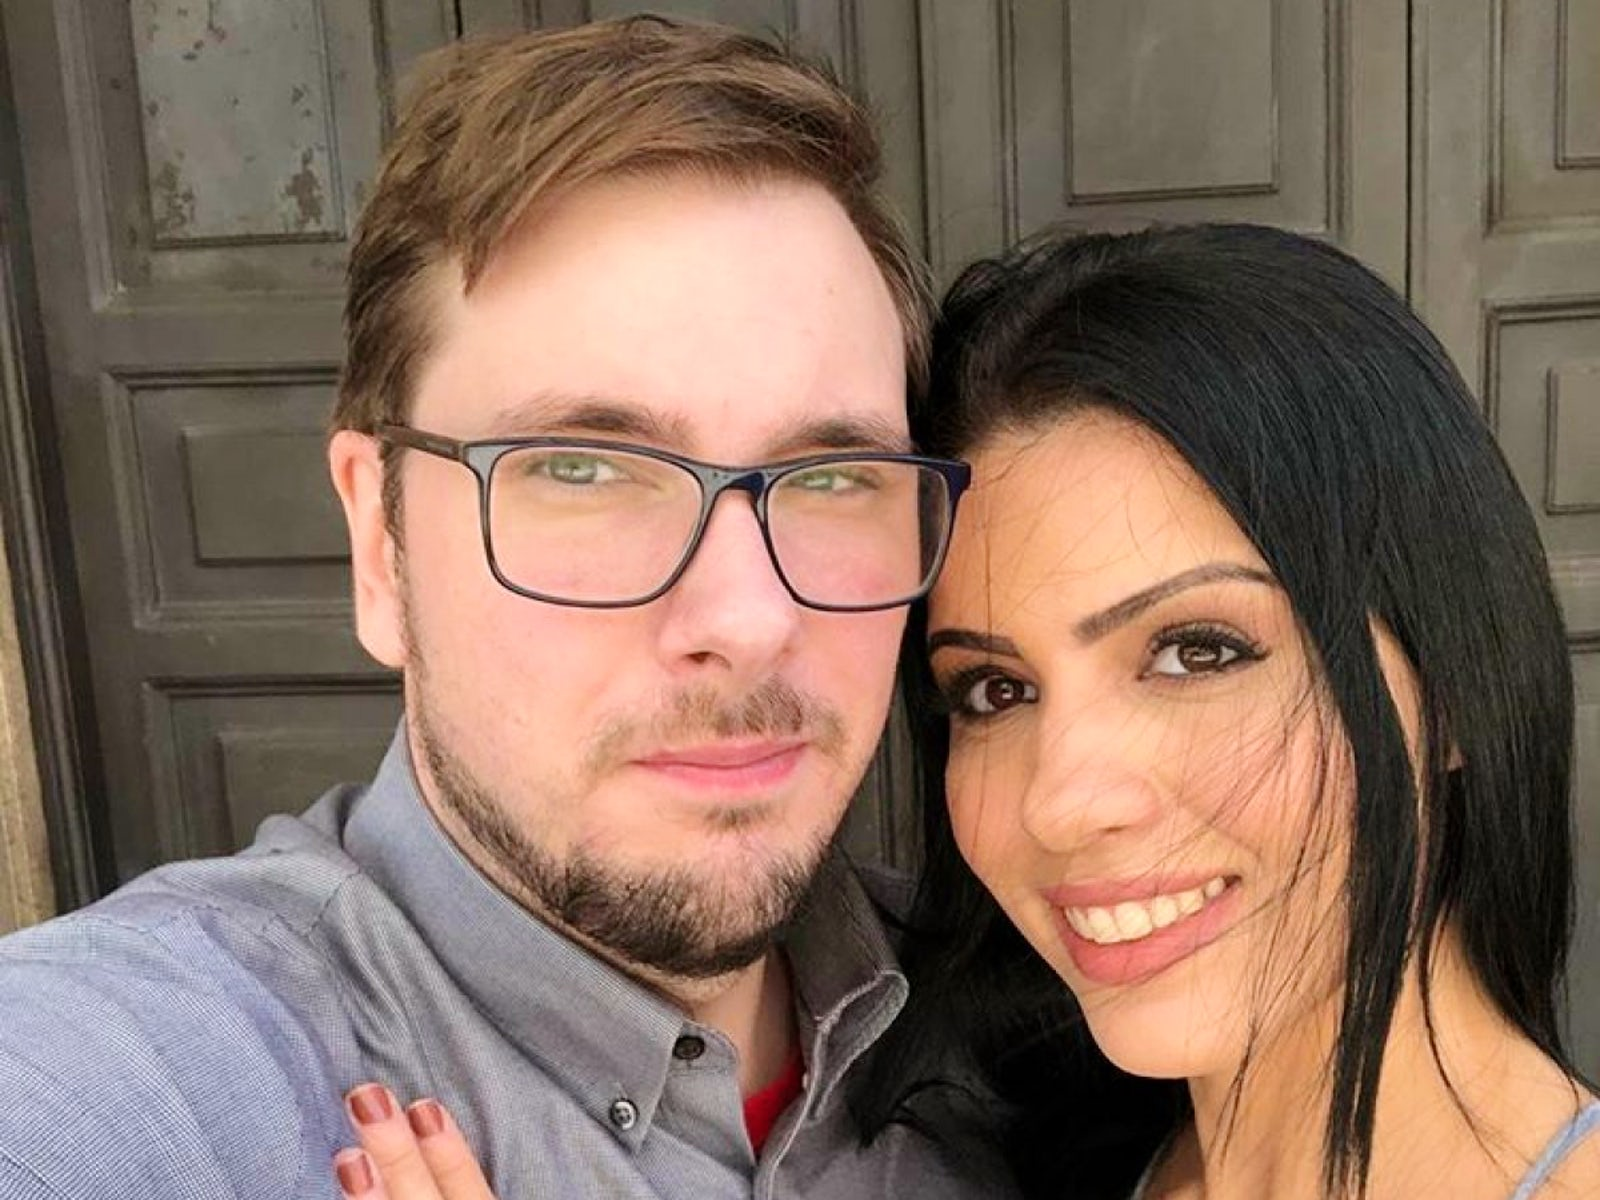 90 Day Fiance' recap: Colt and Larissa get engaged and Olga